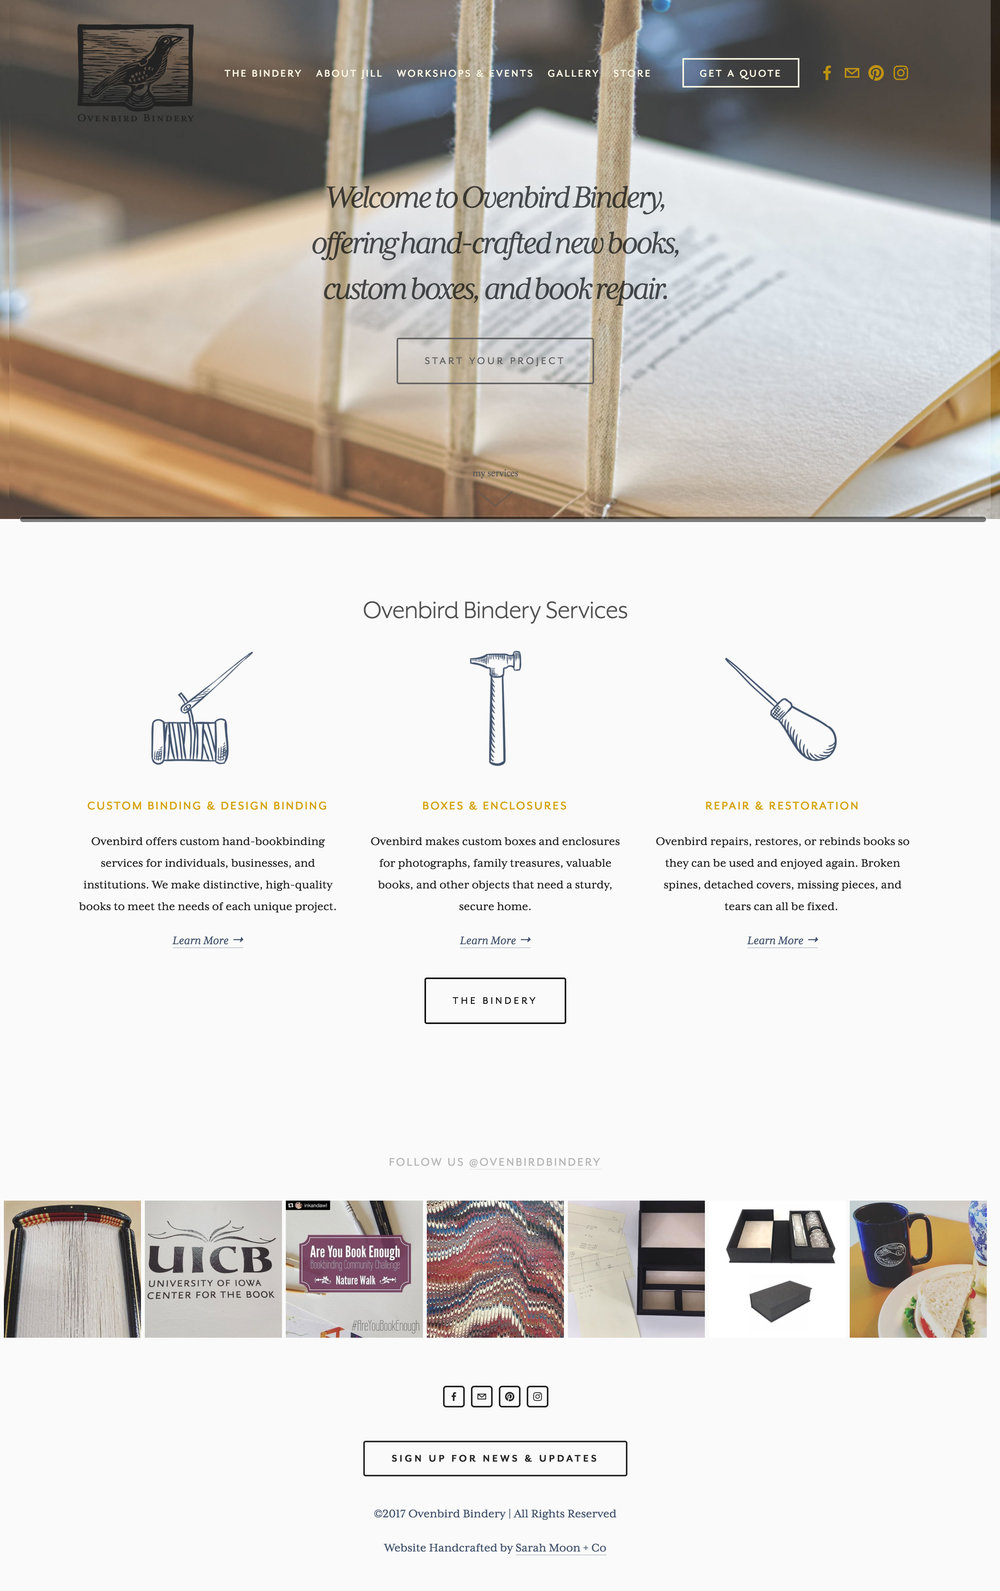 screencapture-ovenbirdbindery-home-WEB.jpg